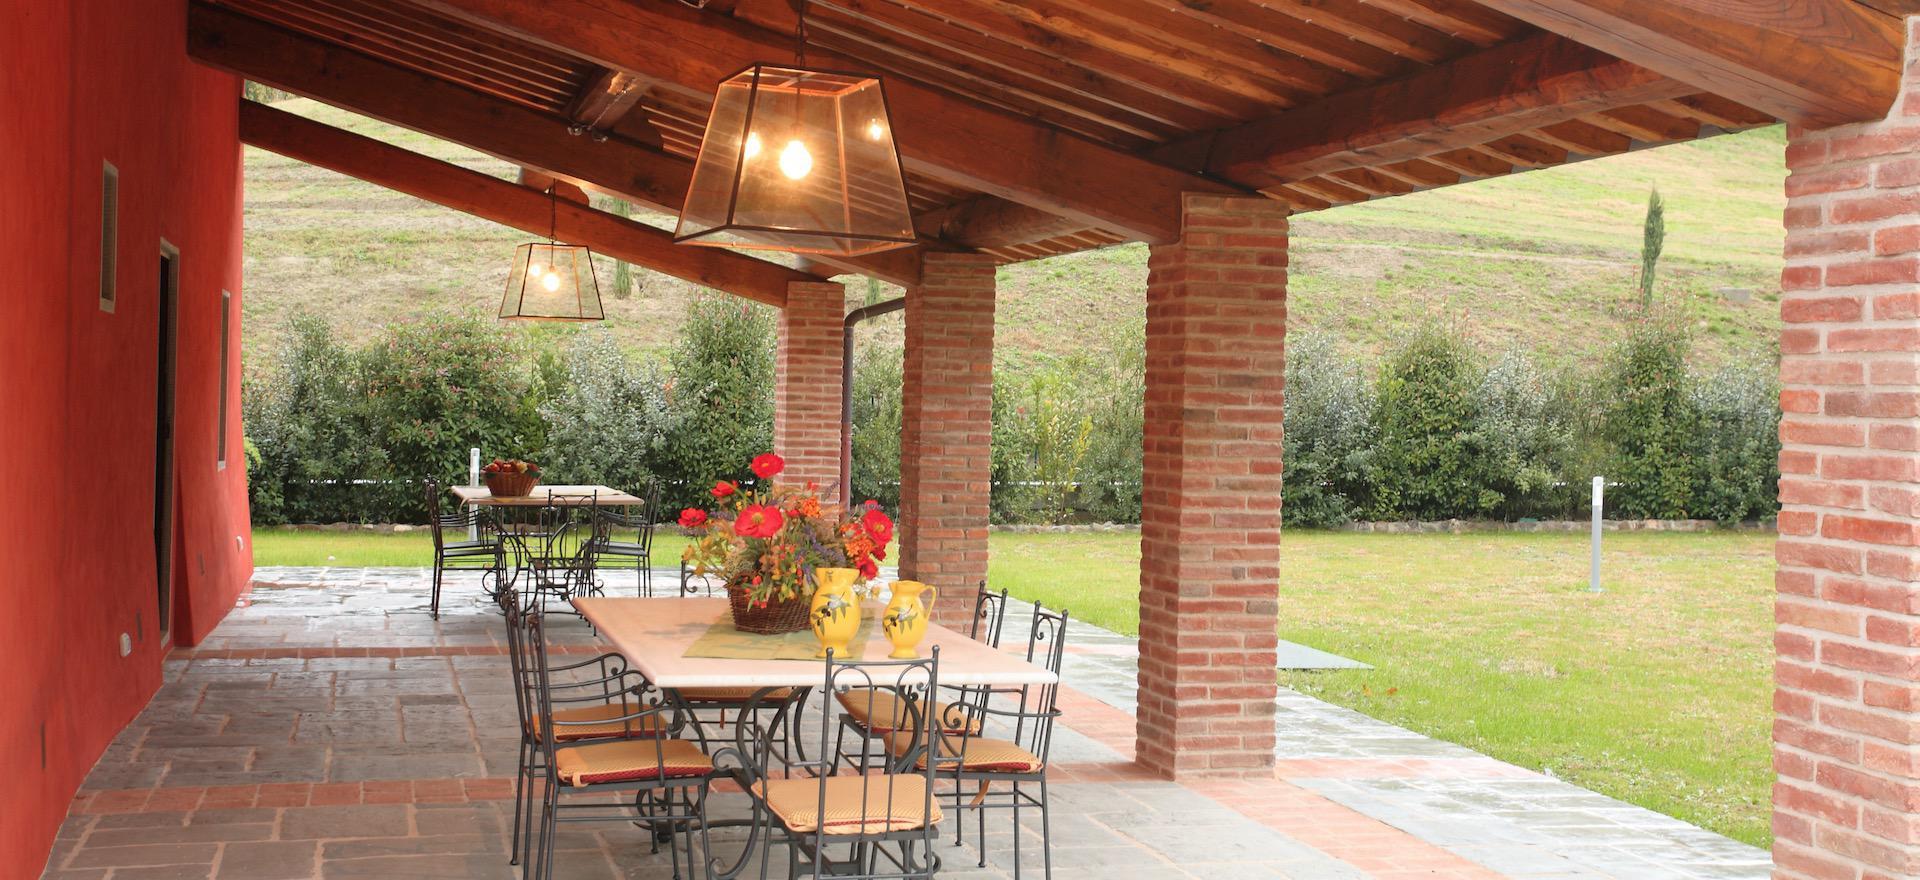 Agriturismo Toscane Agriturismo op prachtig landgoed nabij Florence